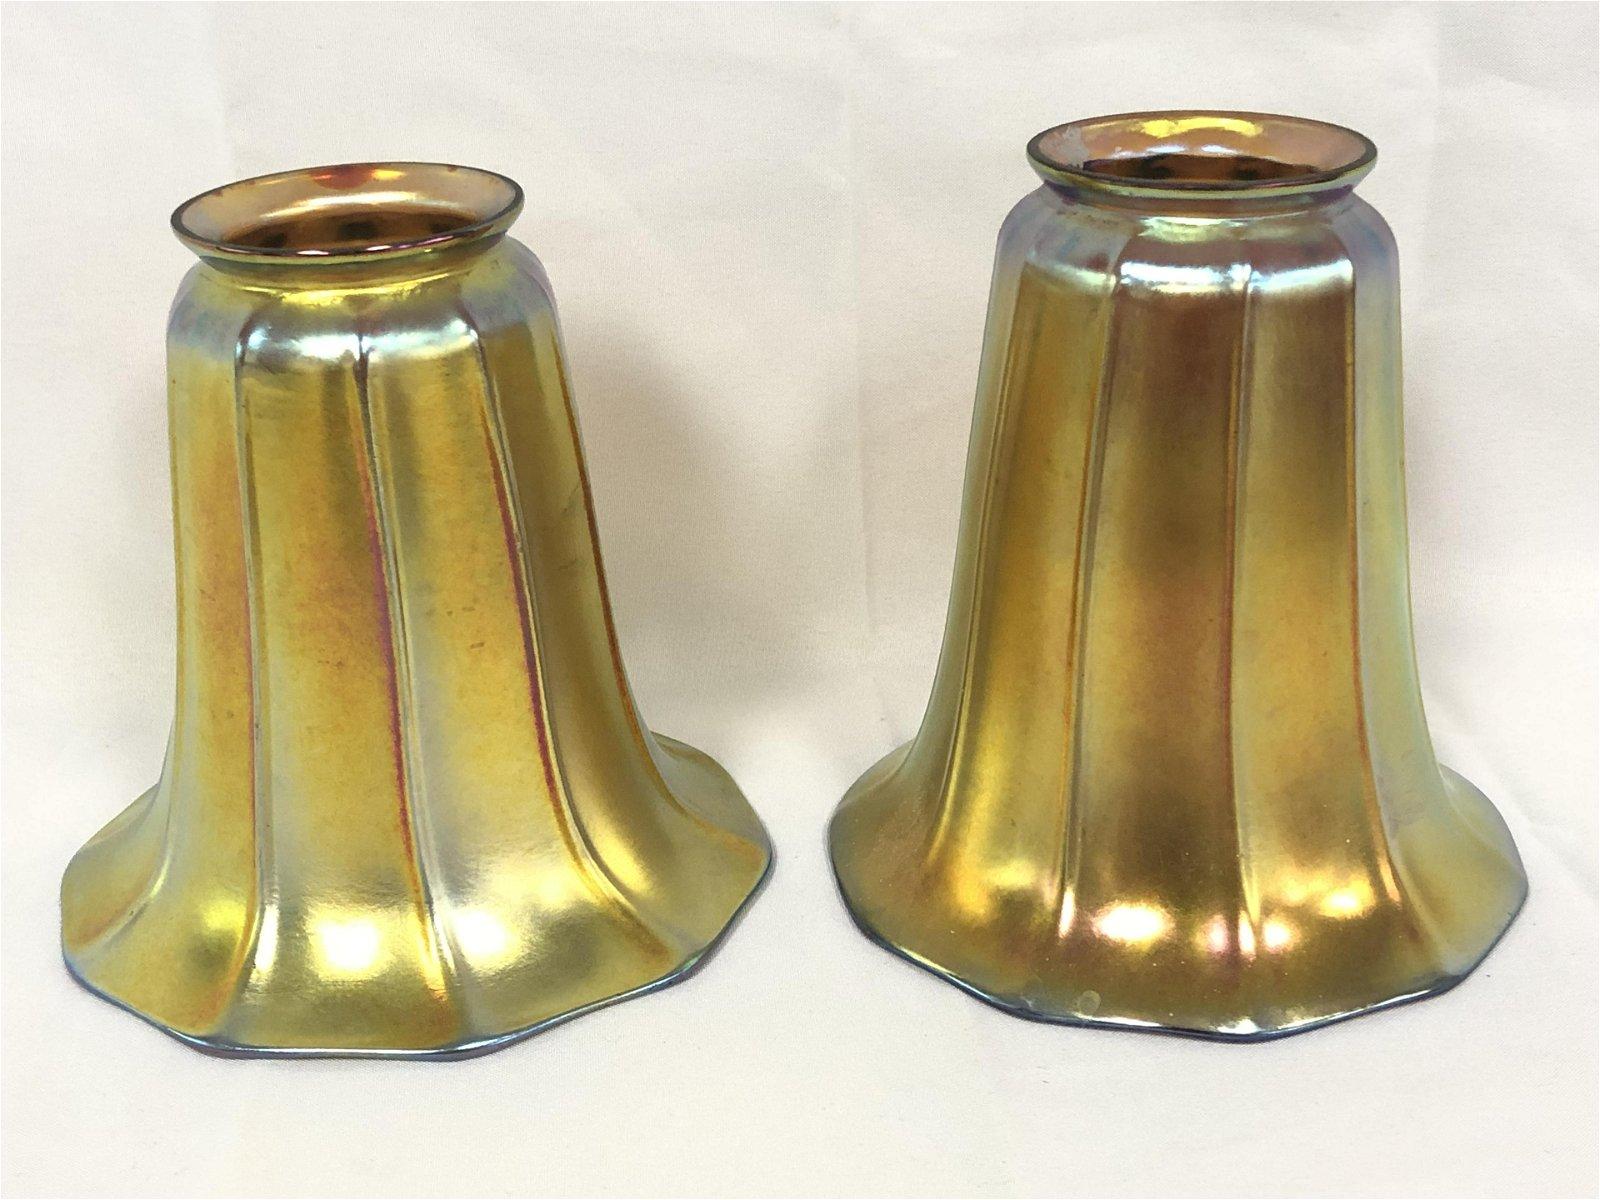 Pr Atq Signed Steuben Aurene Art Glass Shades - Gold